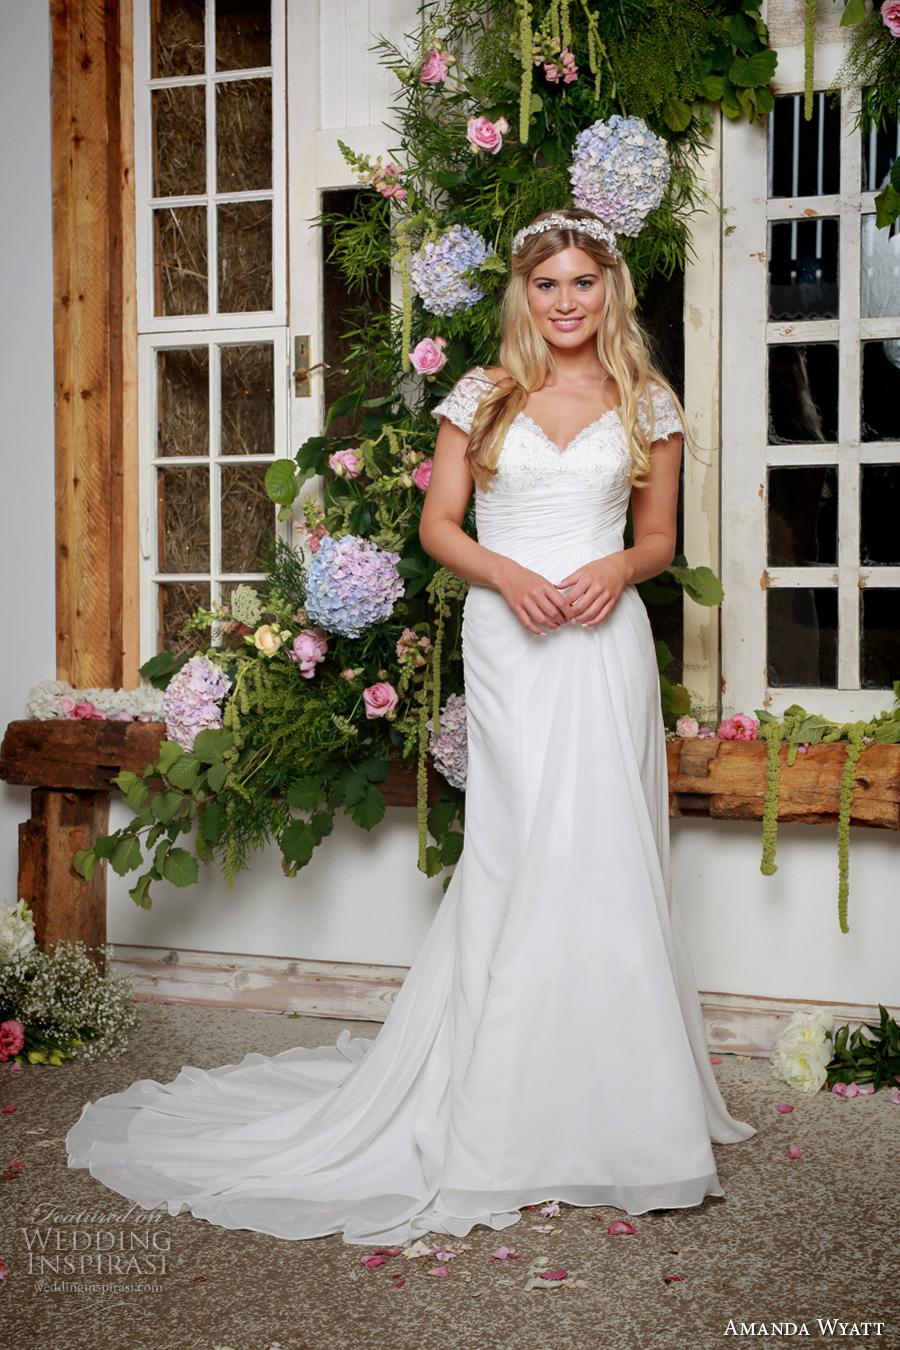 amanda wyatt 2017 bridal cap sleeves scallop v neck heavily embellished bodice classic sheath wedding dress v back sweep train (dakota) mv